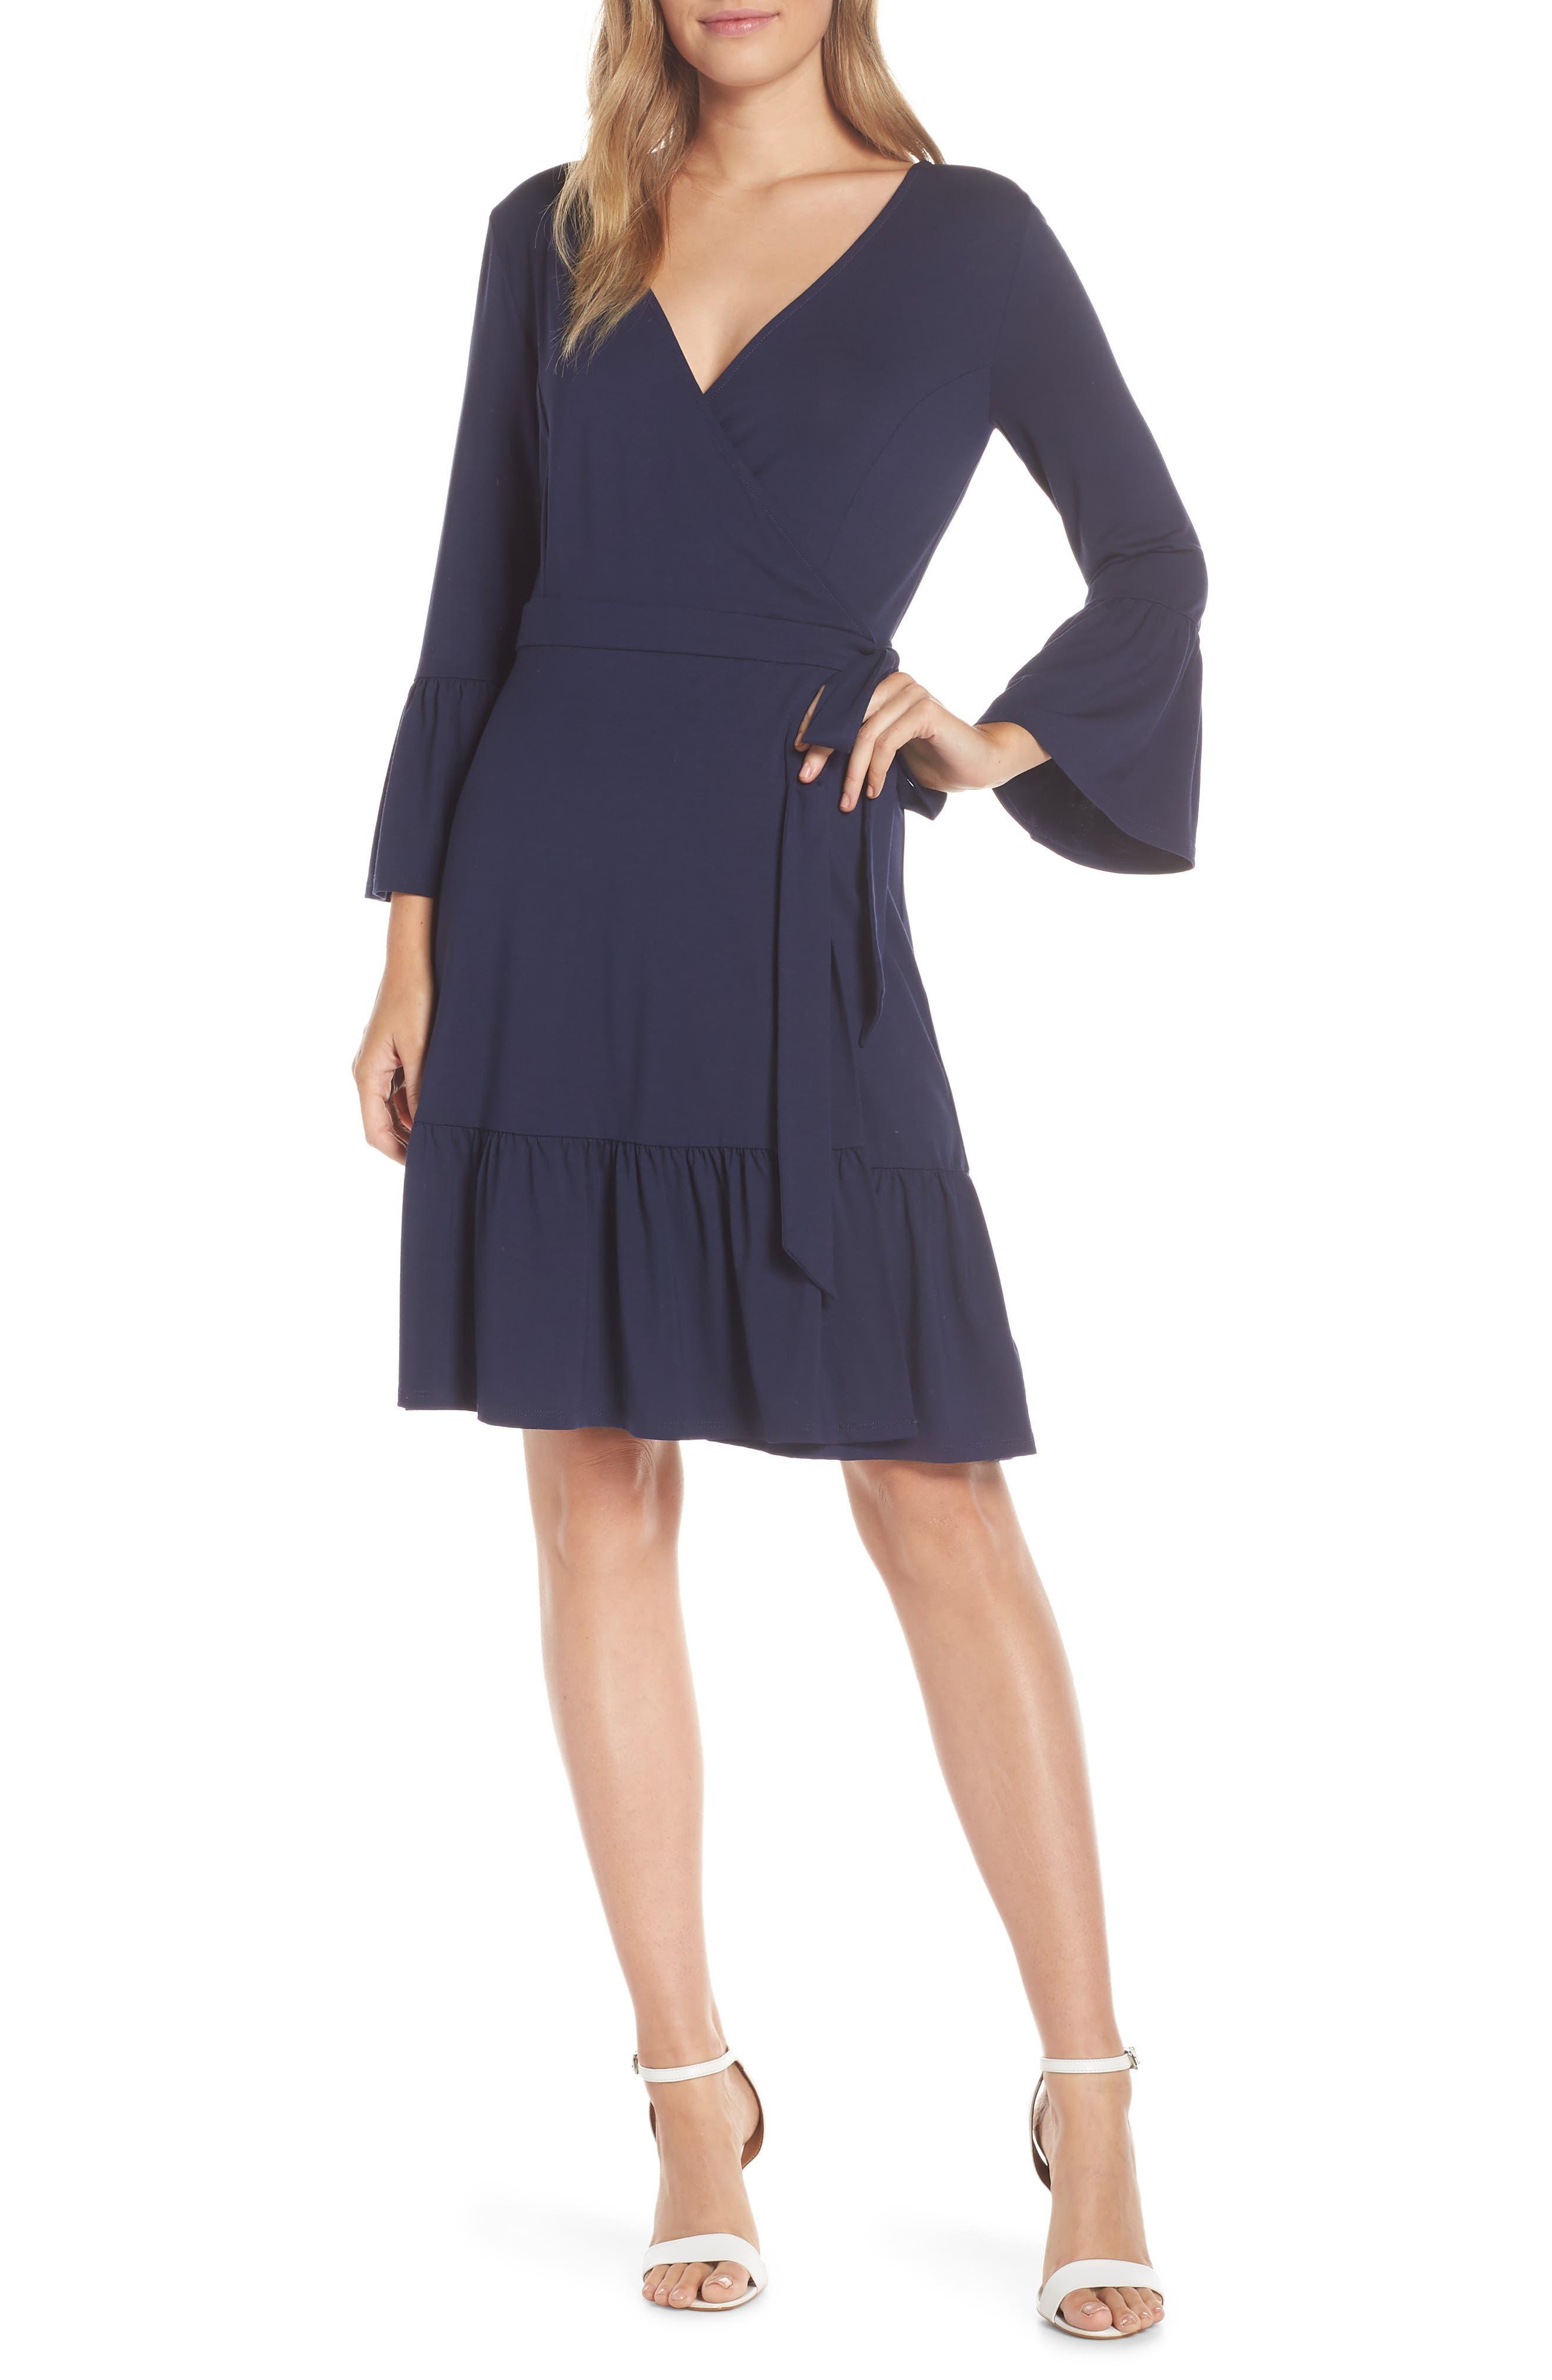 LILLY PULITZER<SUP>®</SUP>, Misha Wrap Dress, Main thumbnail 1, color, TRUE NAVY